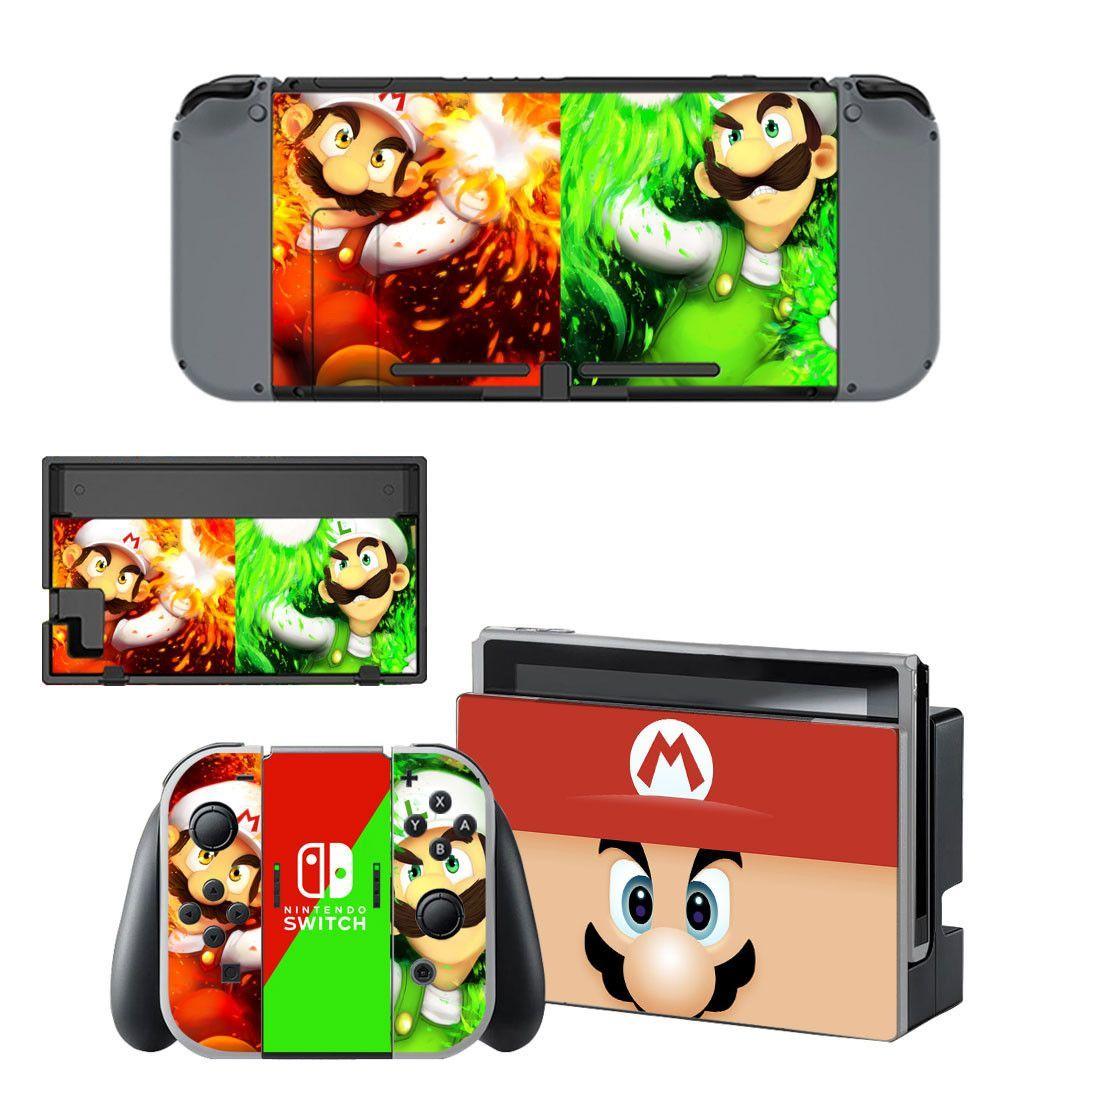 Super Mario Bros design vinyl decal for Nintendo switch console sticker skin